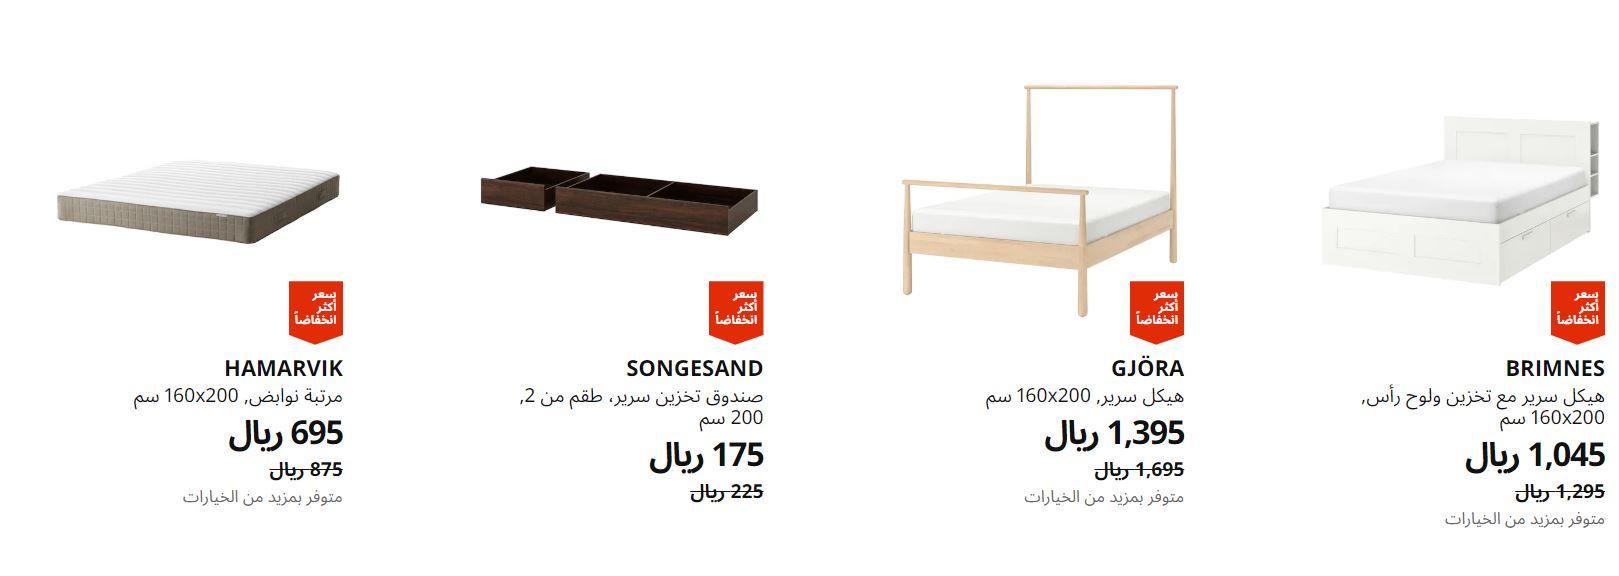 تنزيلات مراتب غرف النوم من IKEA